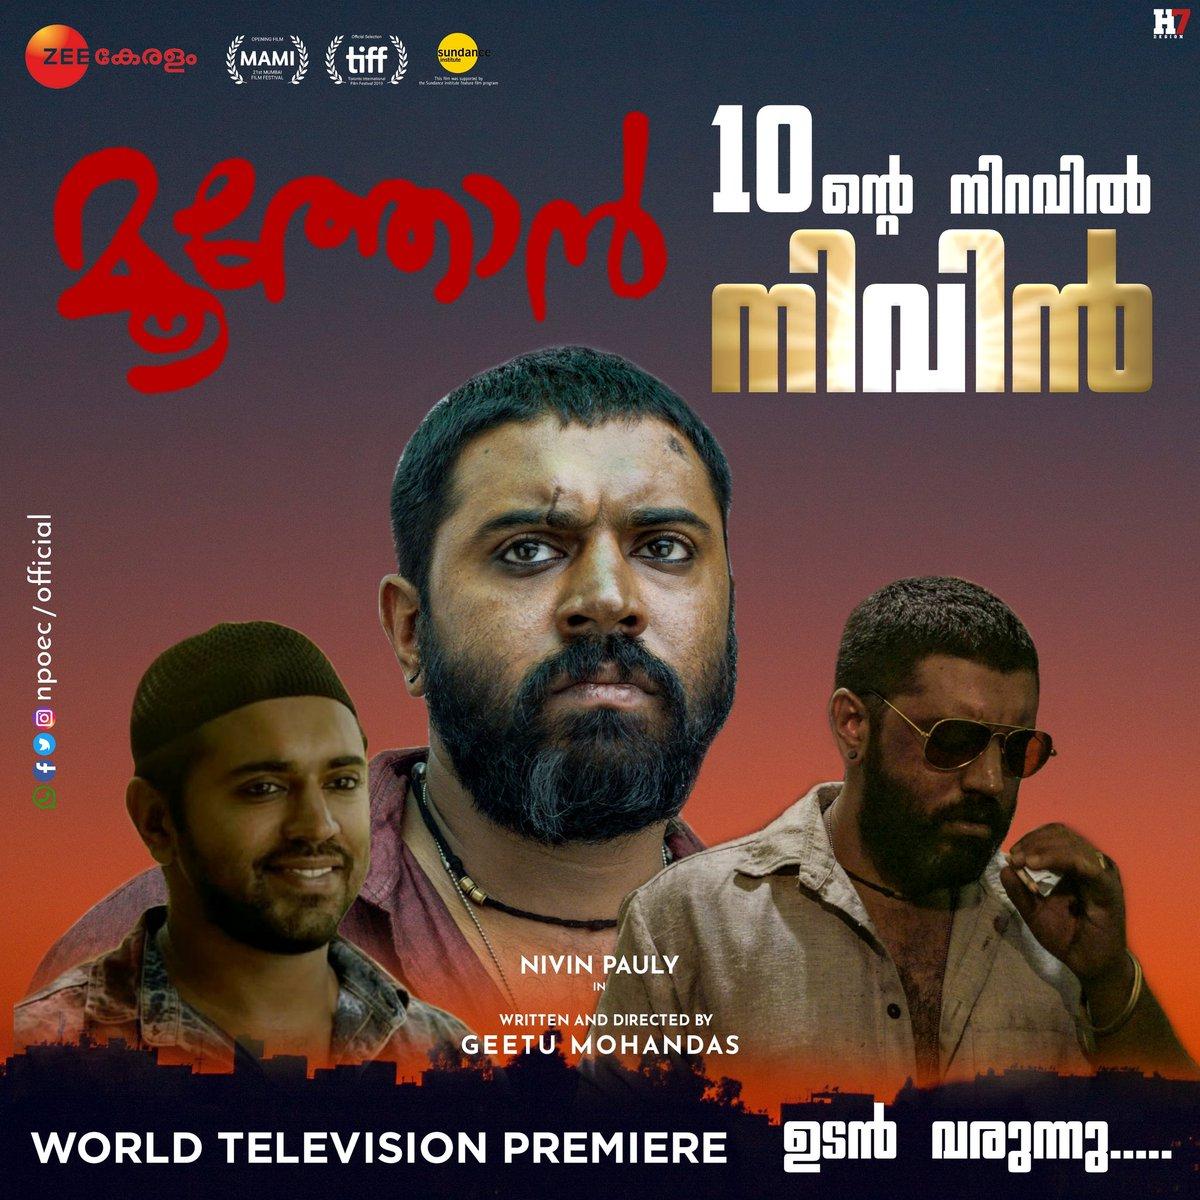 World Television Premiere MOOTHON Malayalam Movie | Nivin Pauly | Geetu Mohandas | Zee Keralam | Coming Soon... #Moothon #NivinPauly #GeetuMohandas #ZeeKeralampic.twitter.com/tCLueTZabq